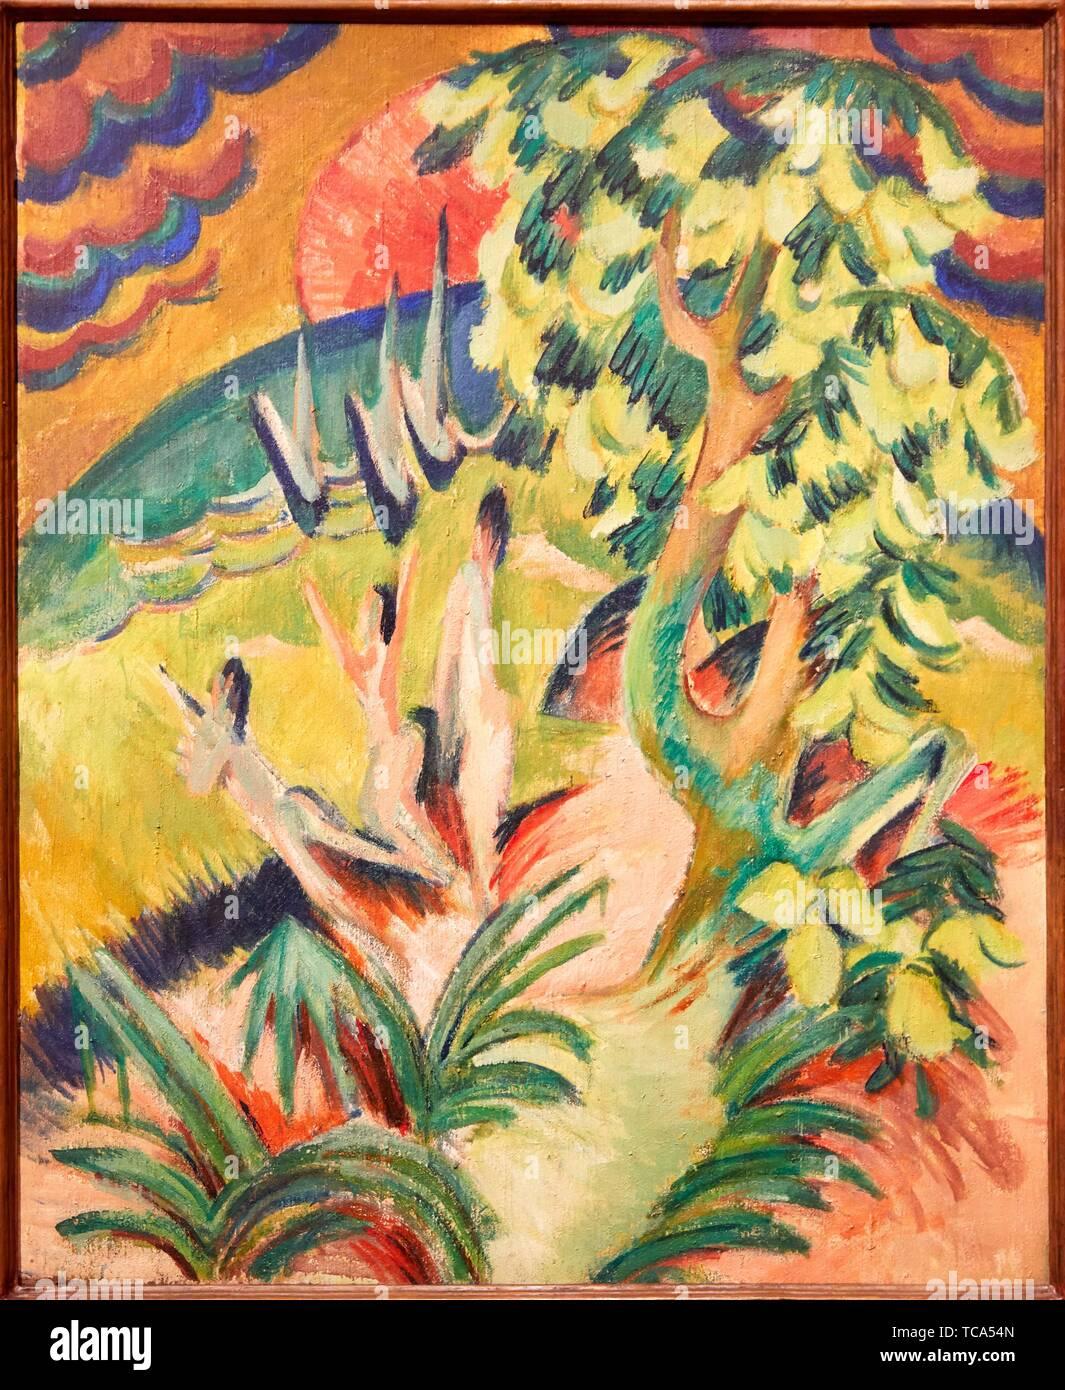 '''Curving Bay'', 1914, Ernst Ludwig Kirchner, Thyssen Bornemisza Museum, Madrid, Spain , Europe - Stock Image